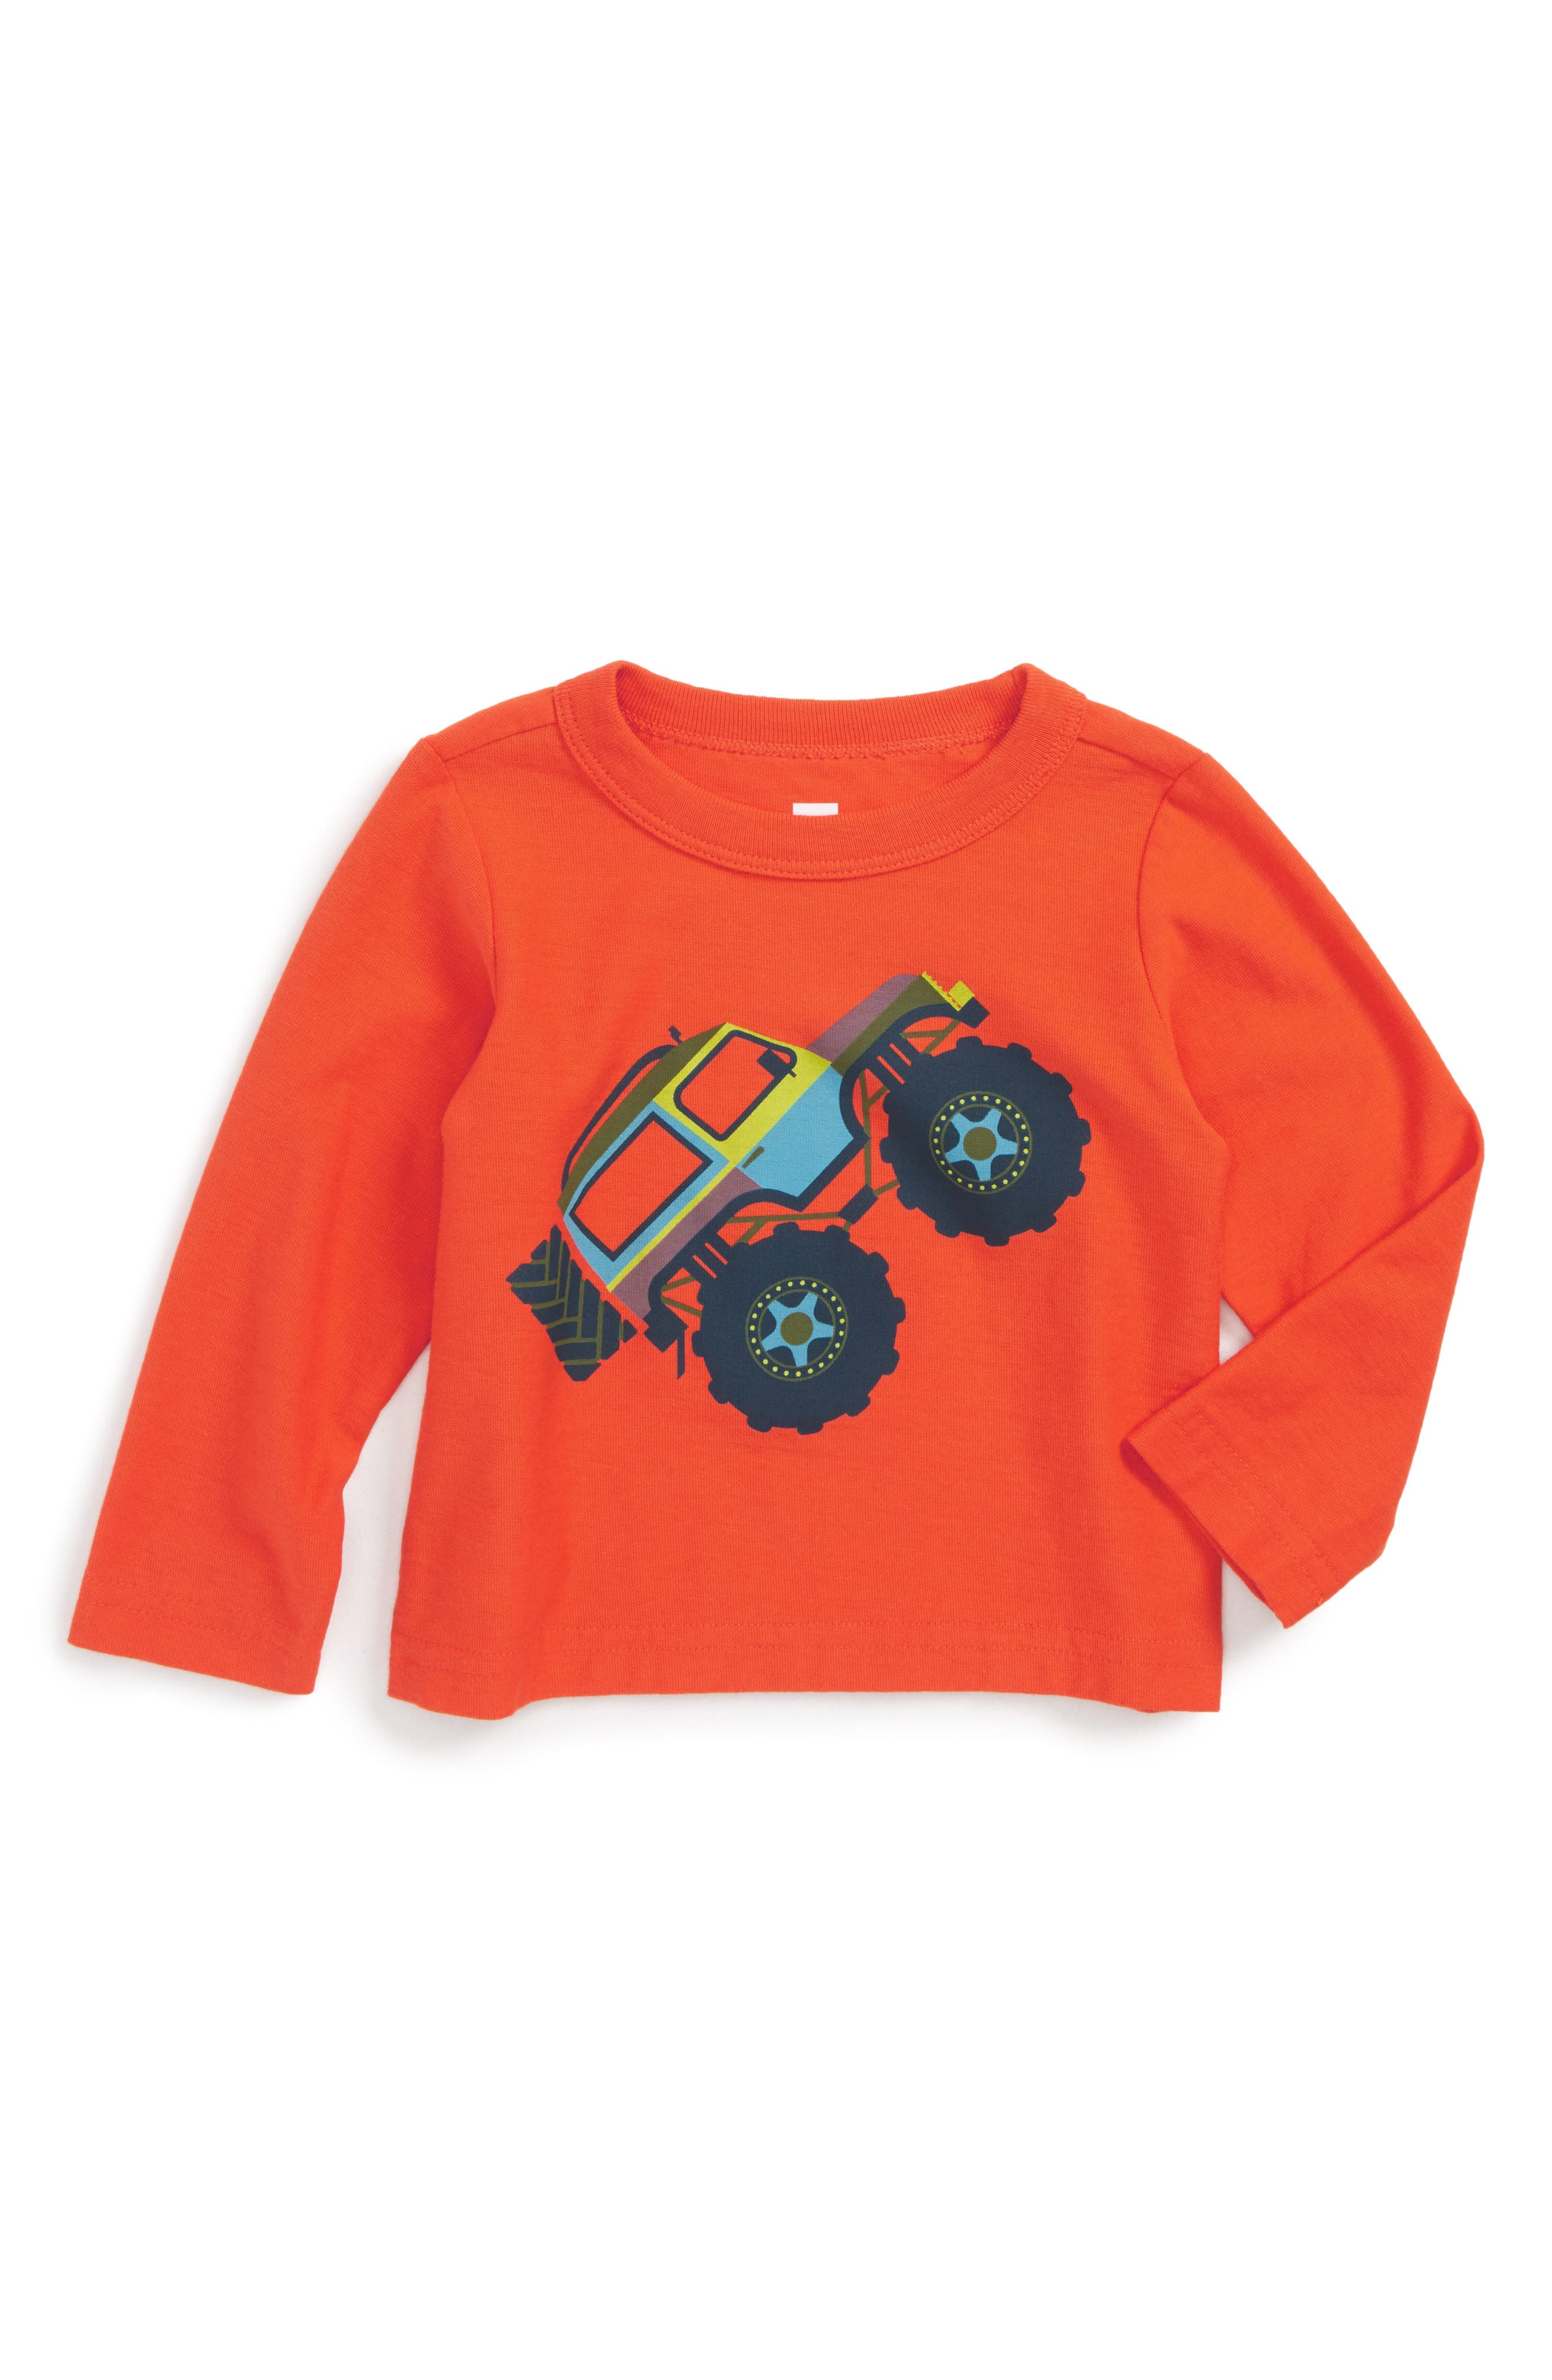 Ward Hill Graphic T-Shirt,                         Main,                         color, 604